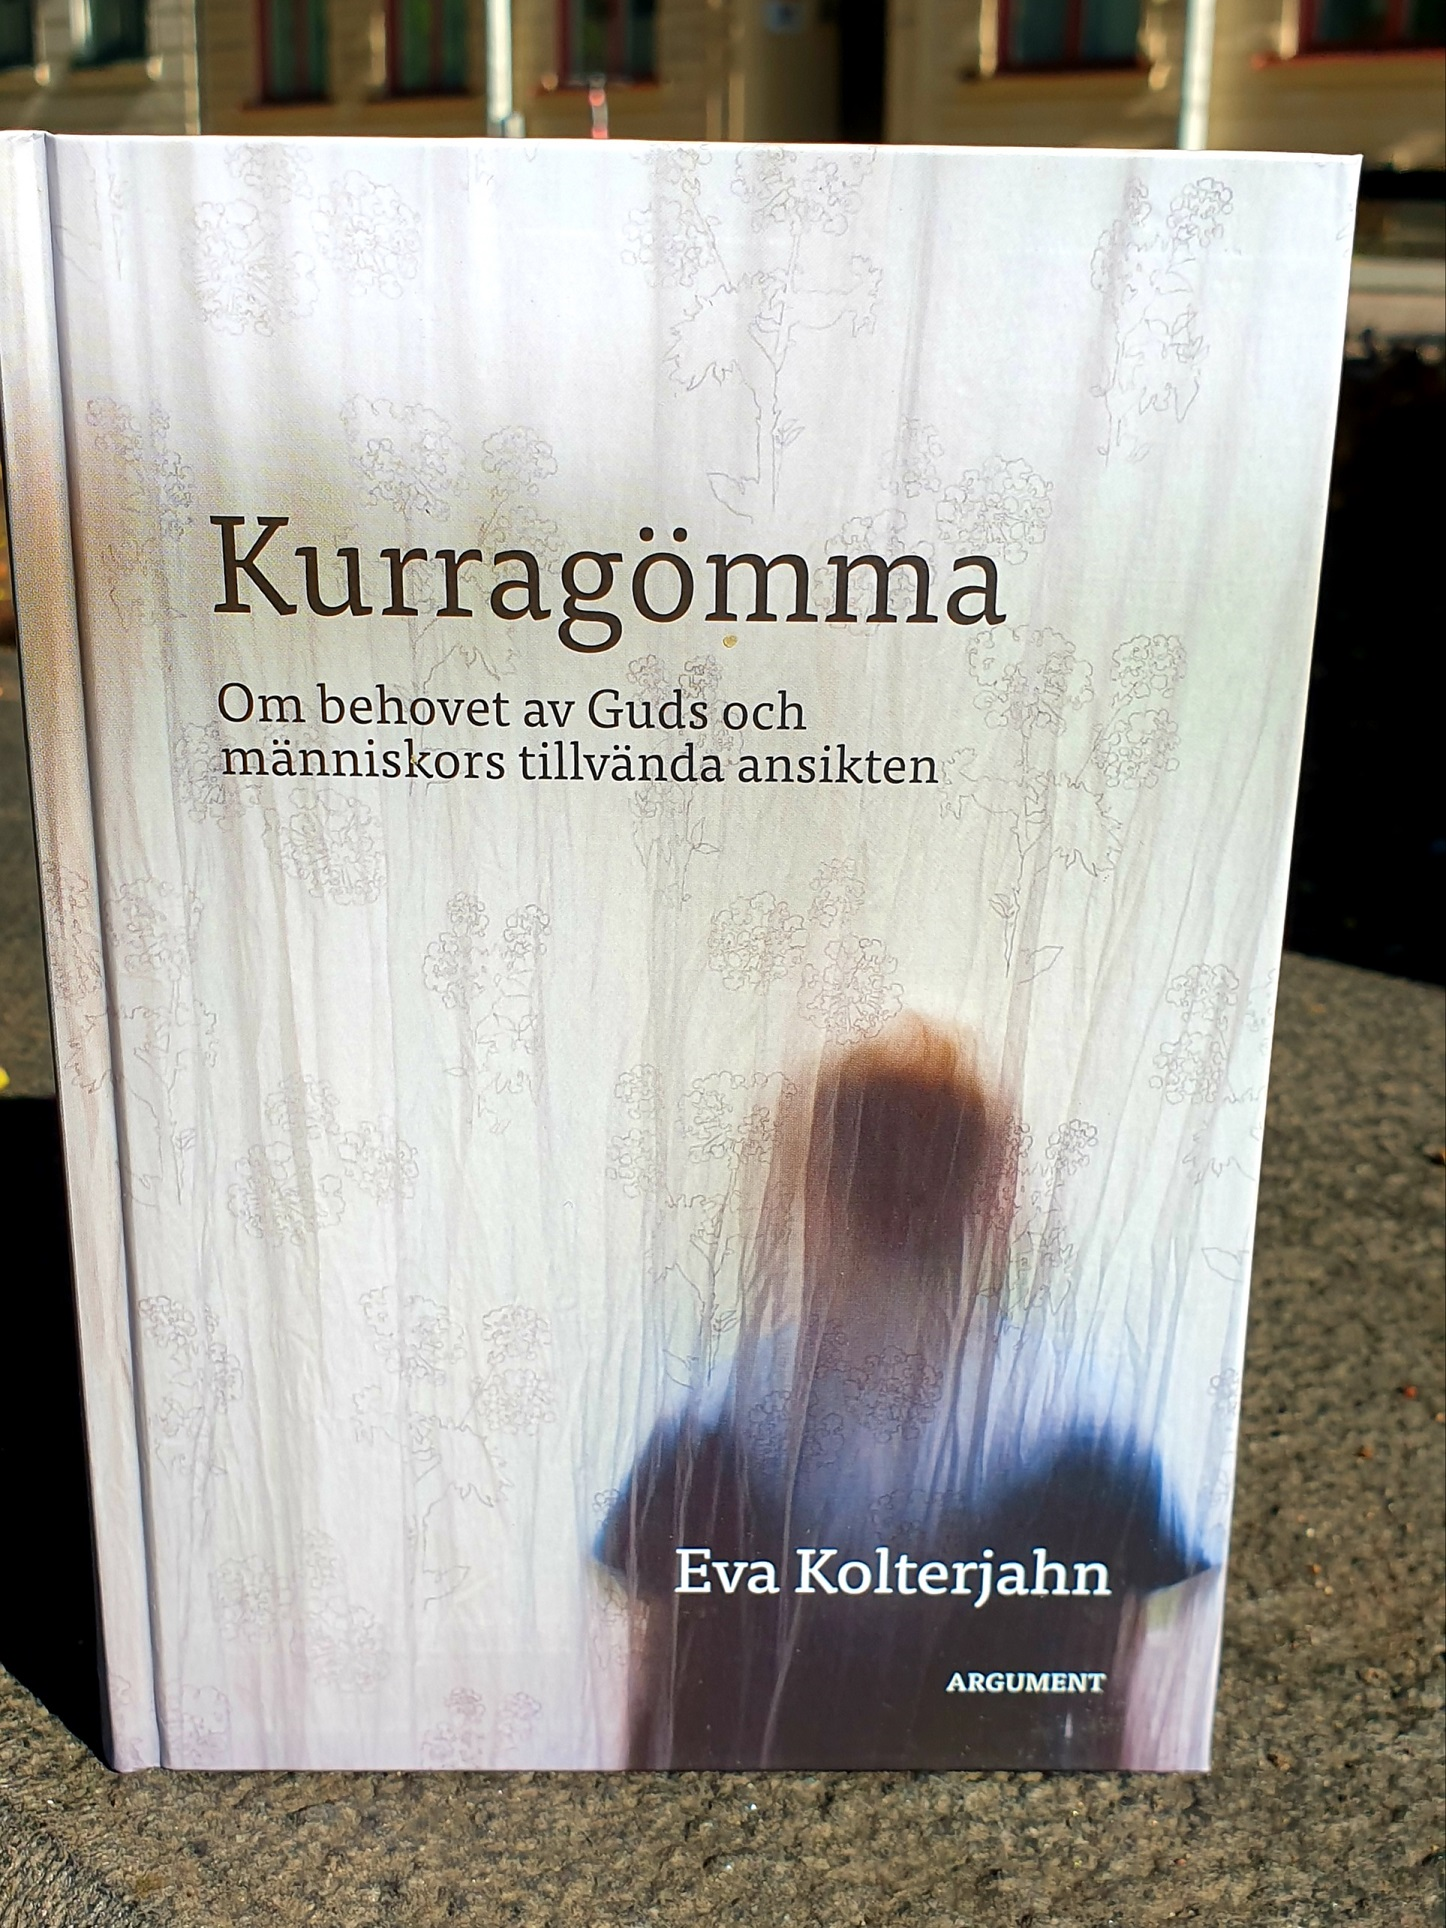 Kurragömma artikelnummer 2552 via bibelbutiken.se